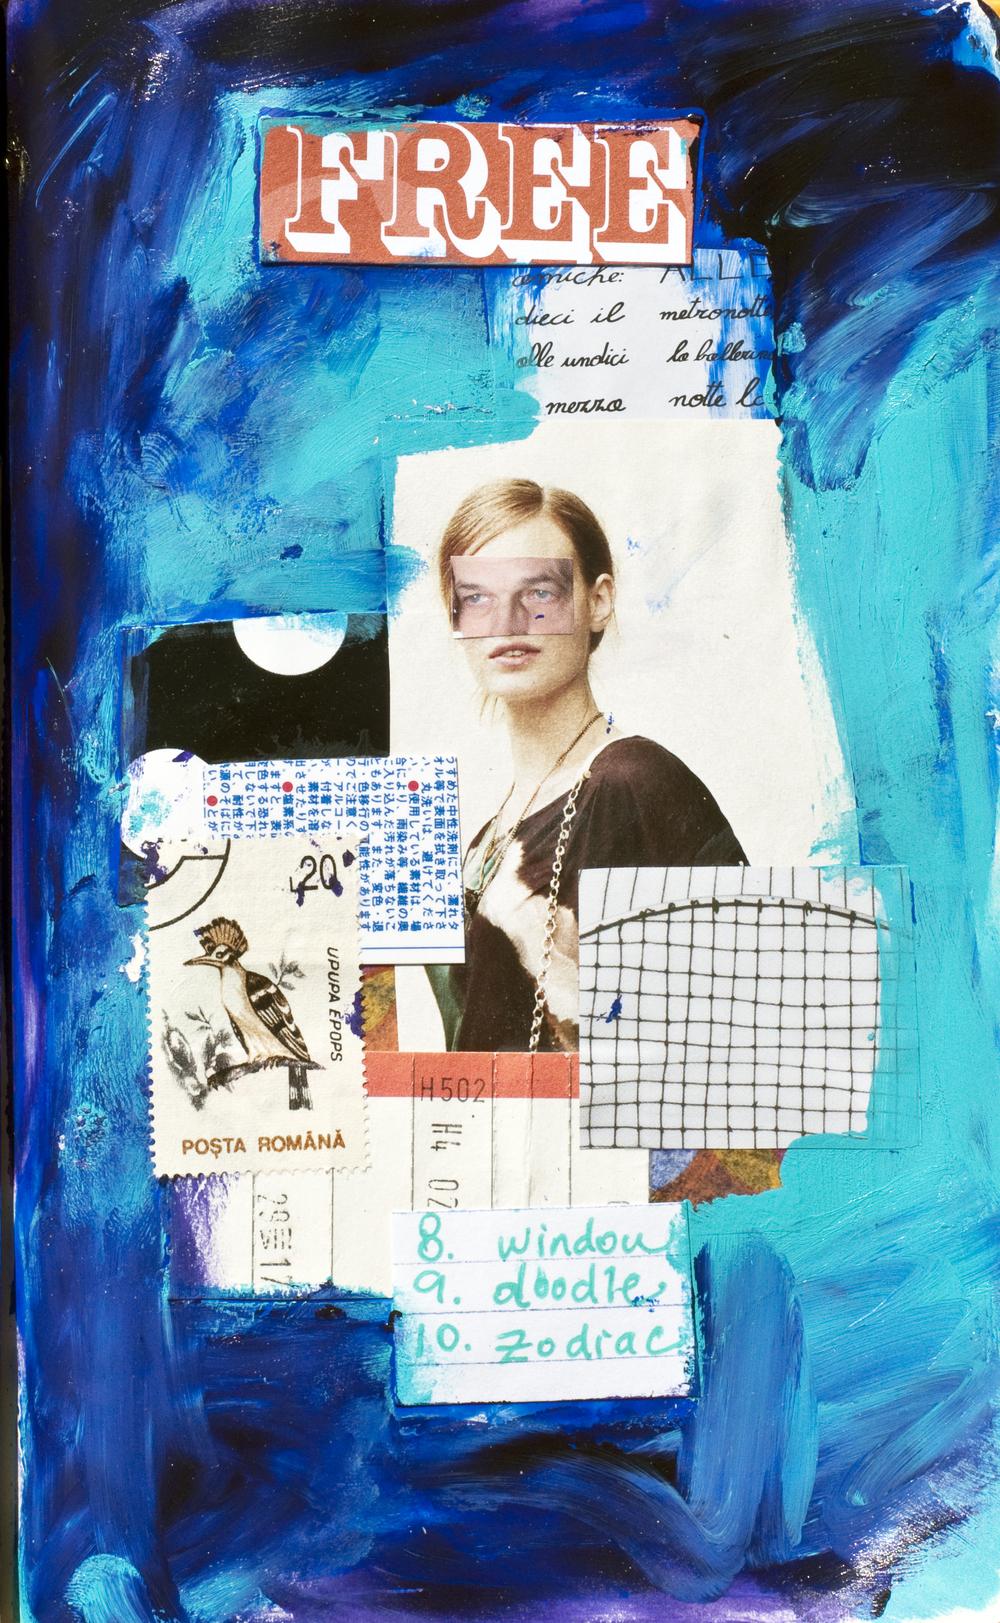 acrylics, collage